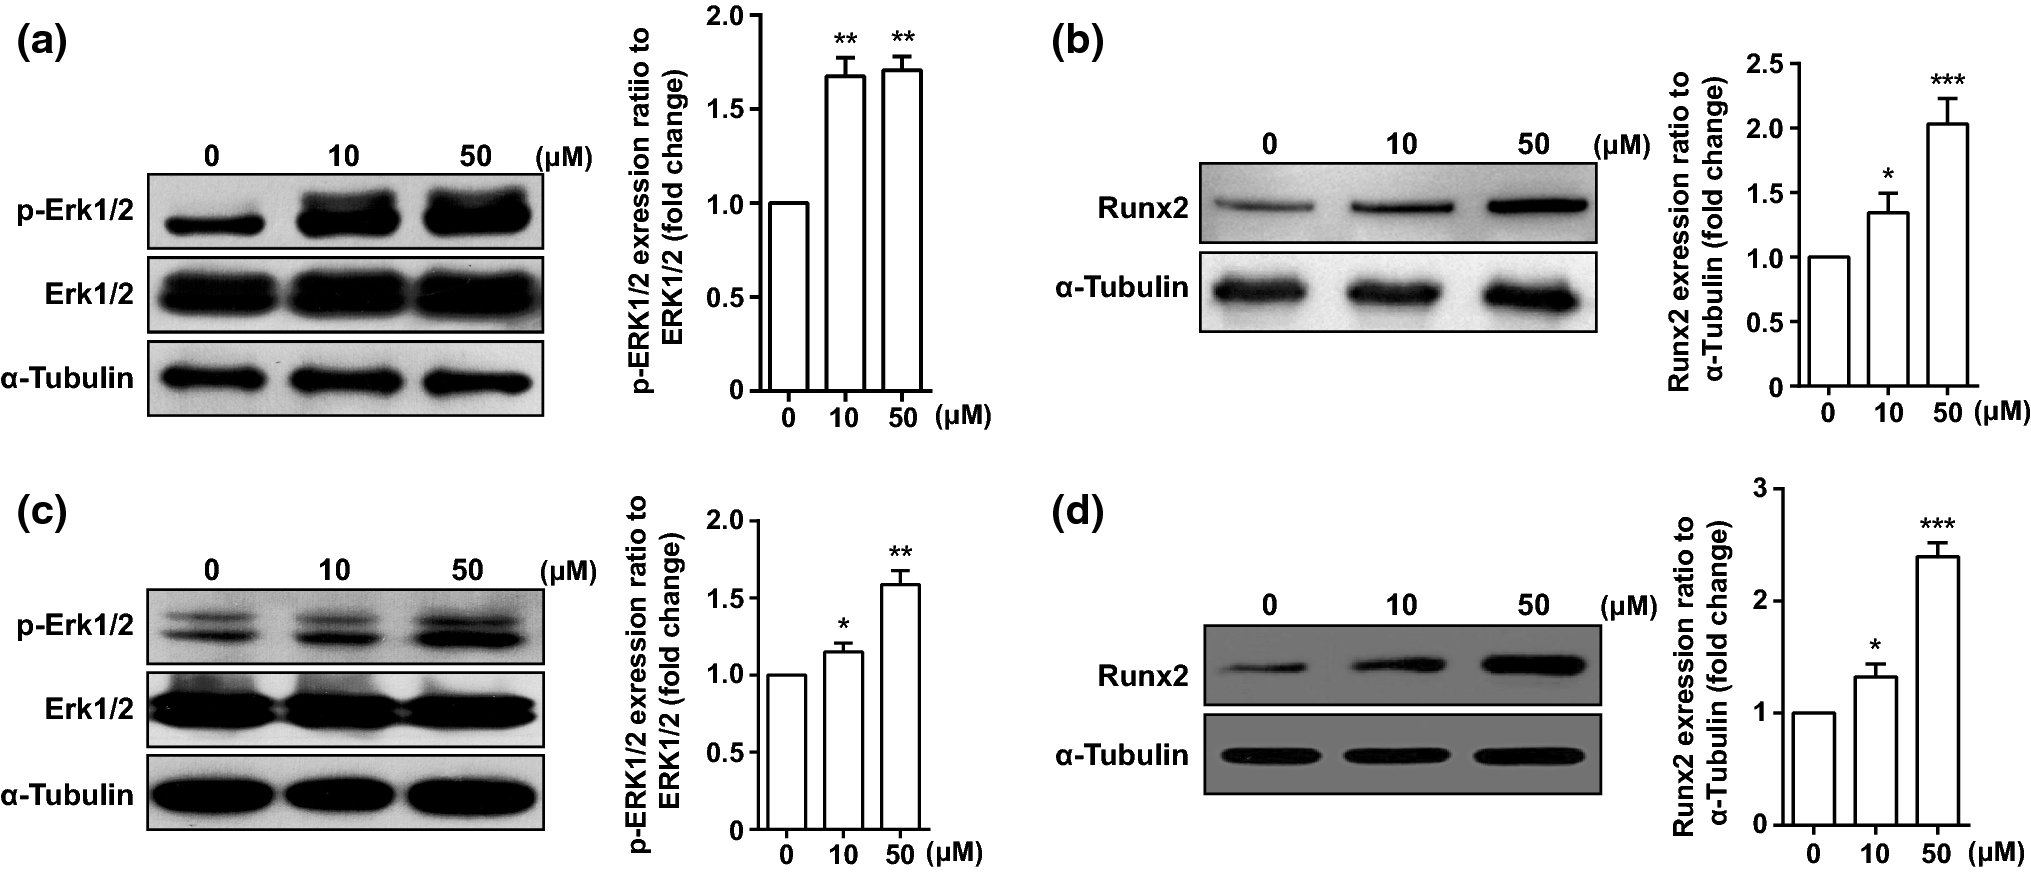 Aloin Promotes Osteogenesis Of Bone Marrow Derived Mesenchymal Stem Alkaline Battery Diagram Twinkle Toes Engineering Open Image In New Window